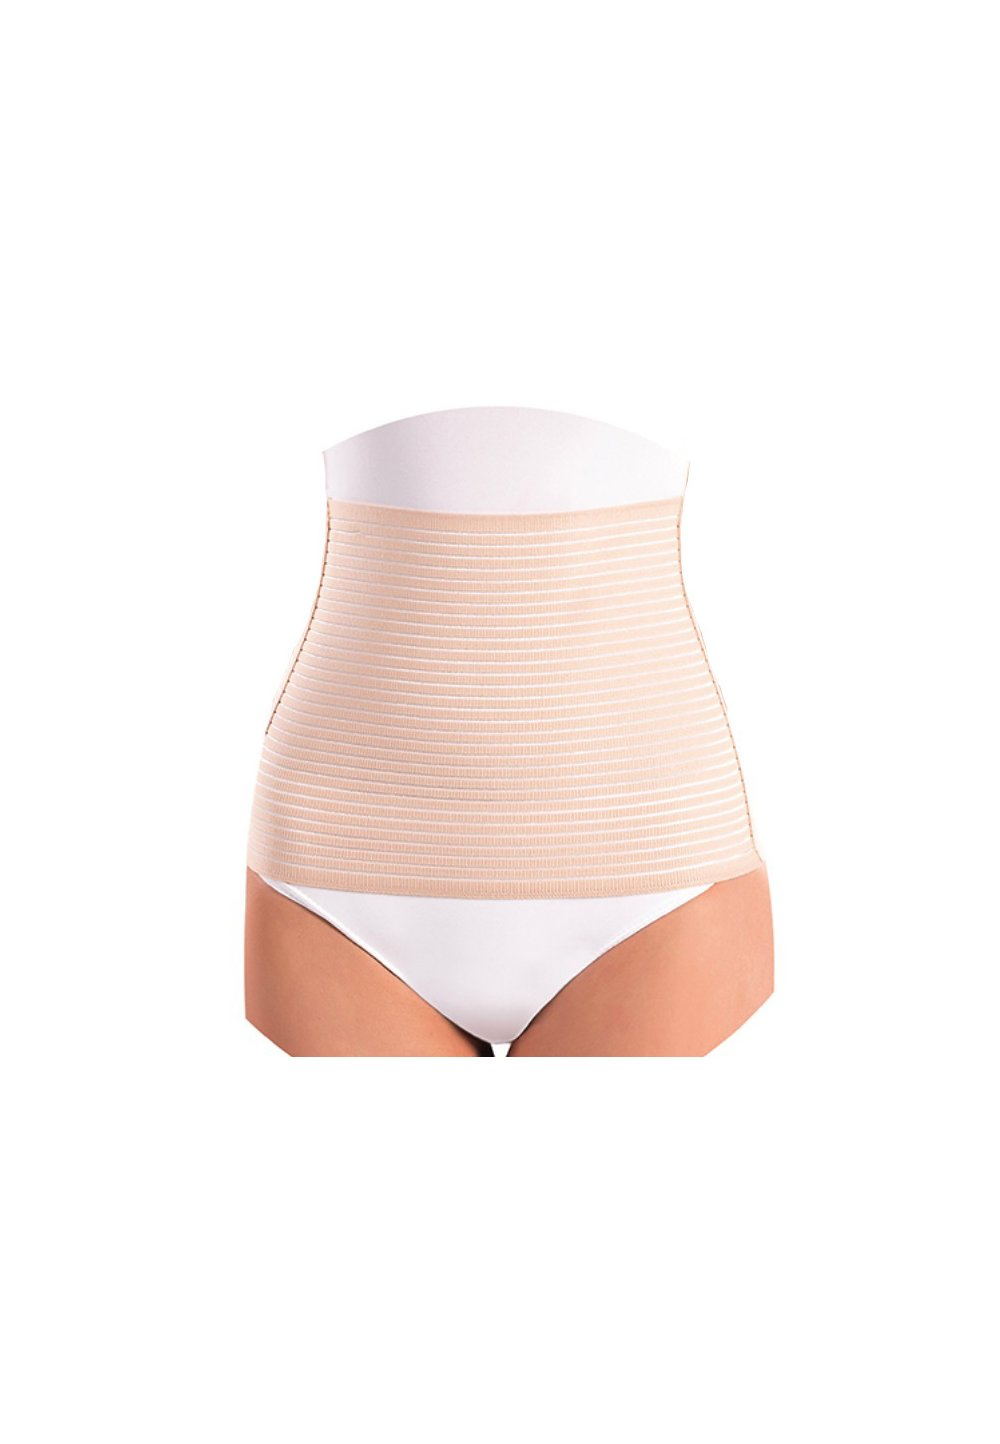 Centura abdominala postnatala, Expert imagine